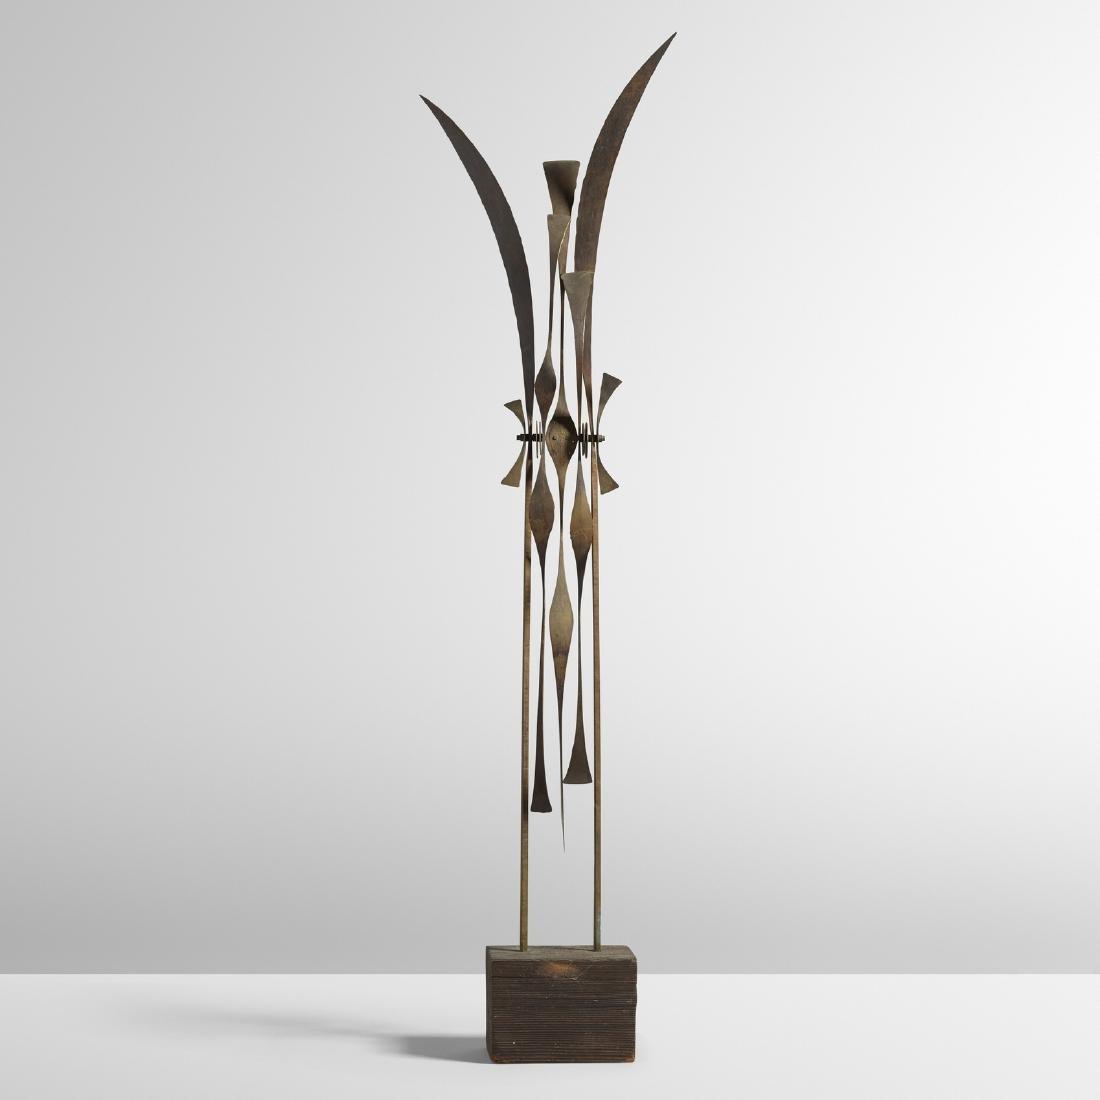 John Prip, Untitled (Kinetic Construction)